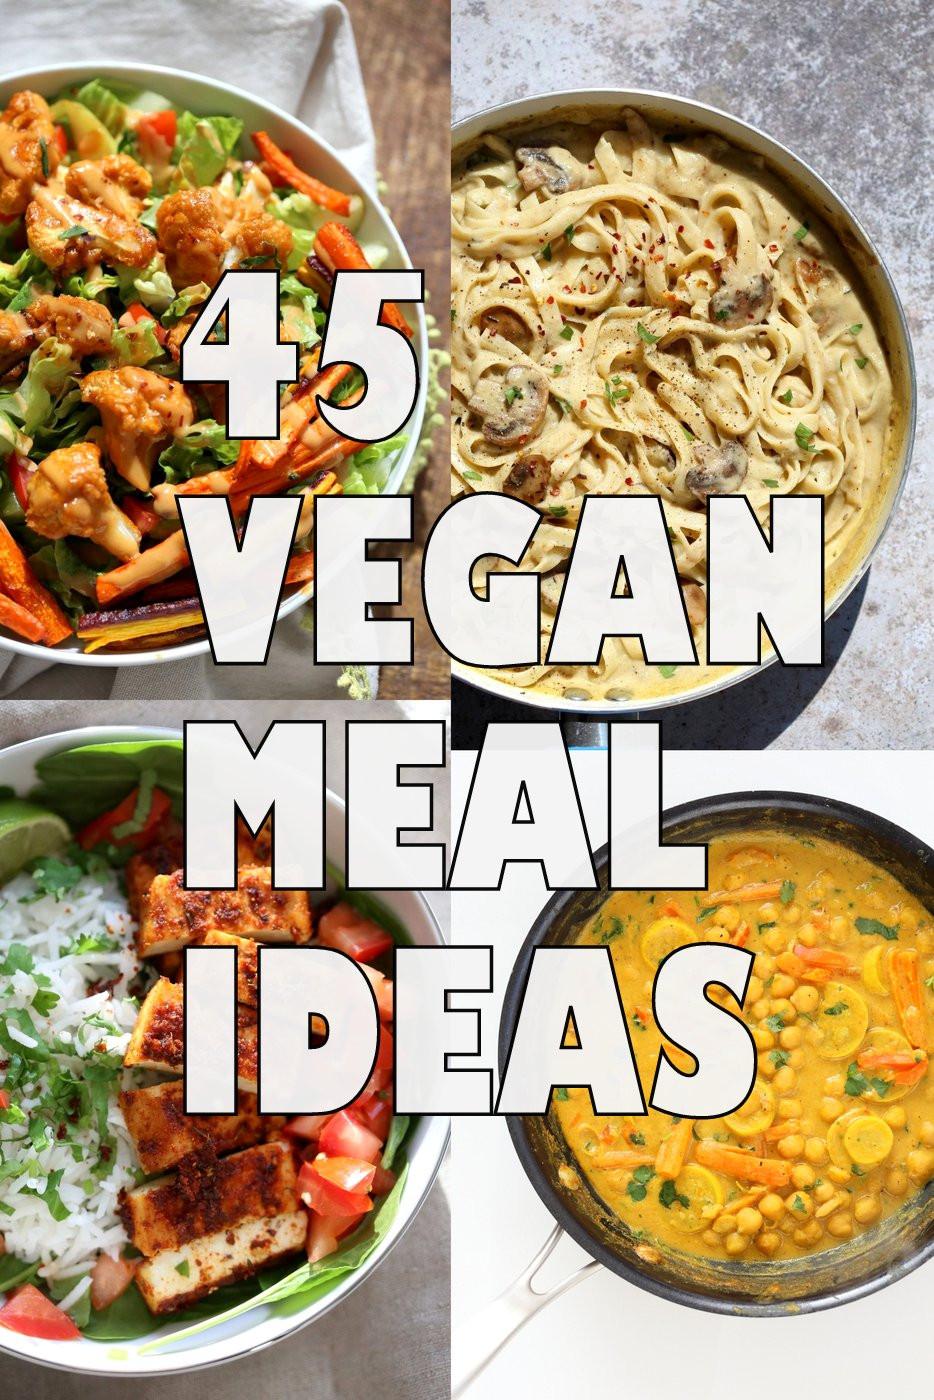 Healthy Vegan Dinner Recipes  45 Healthy Vegan Meals for Veganuary Vegan Richa